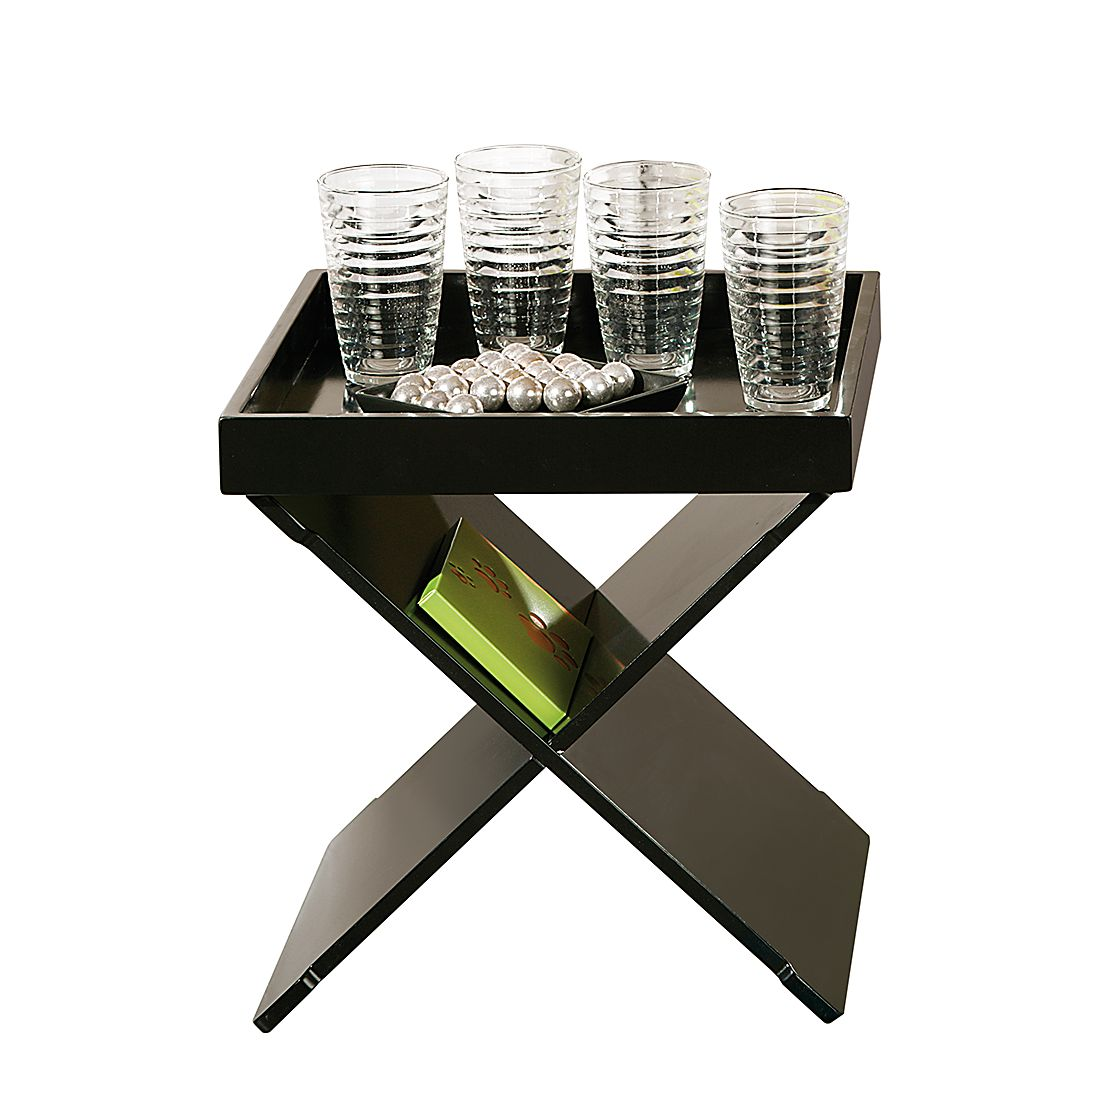 preisvergleich eu beistelltisch hochglanz. Black Bedroom Furniture Sets. Home Design Ideas